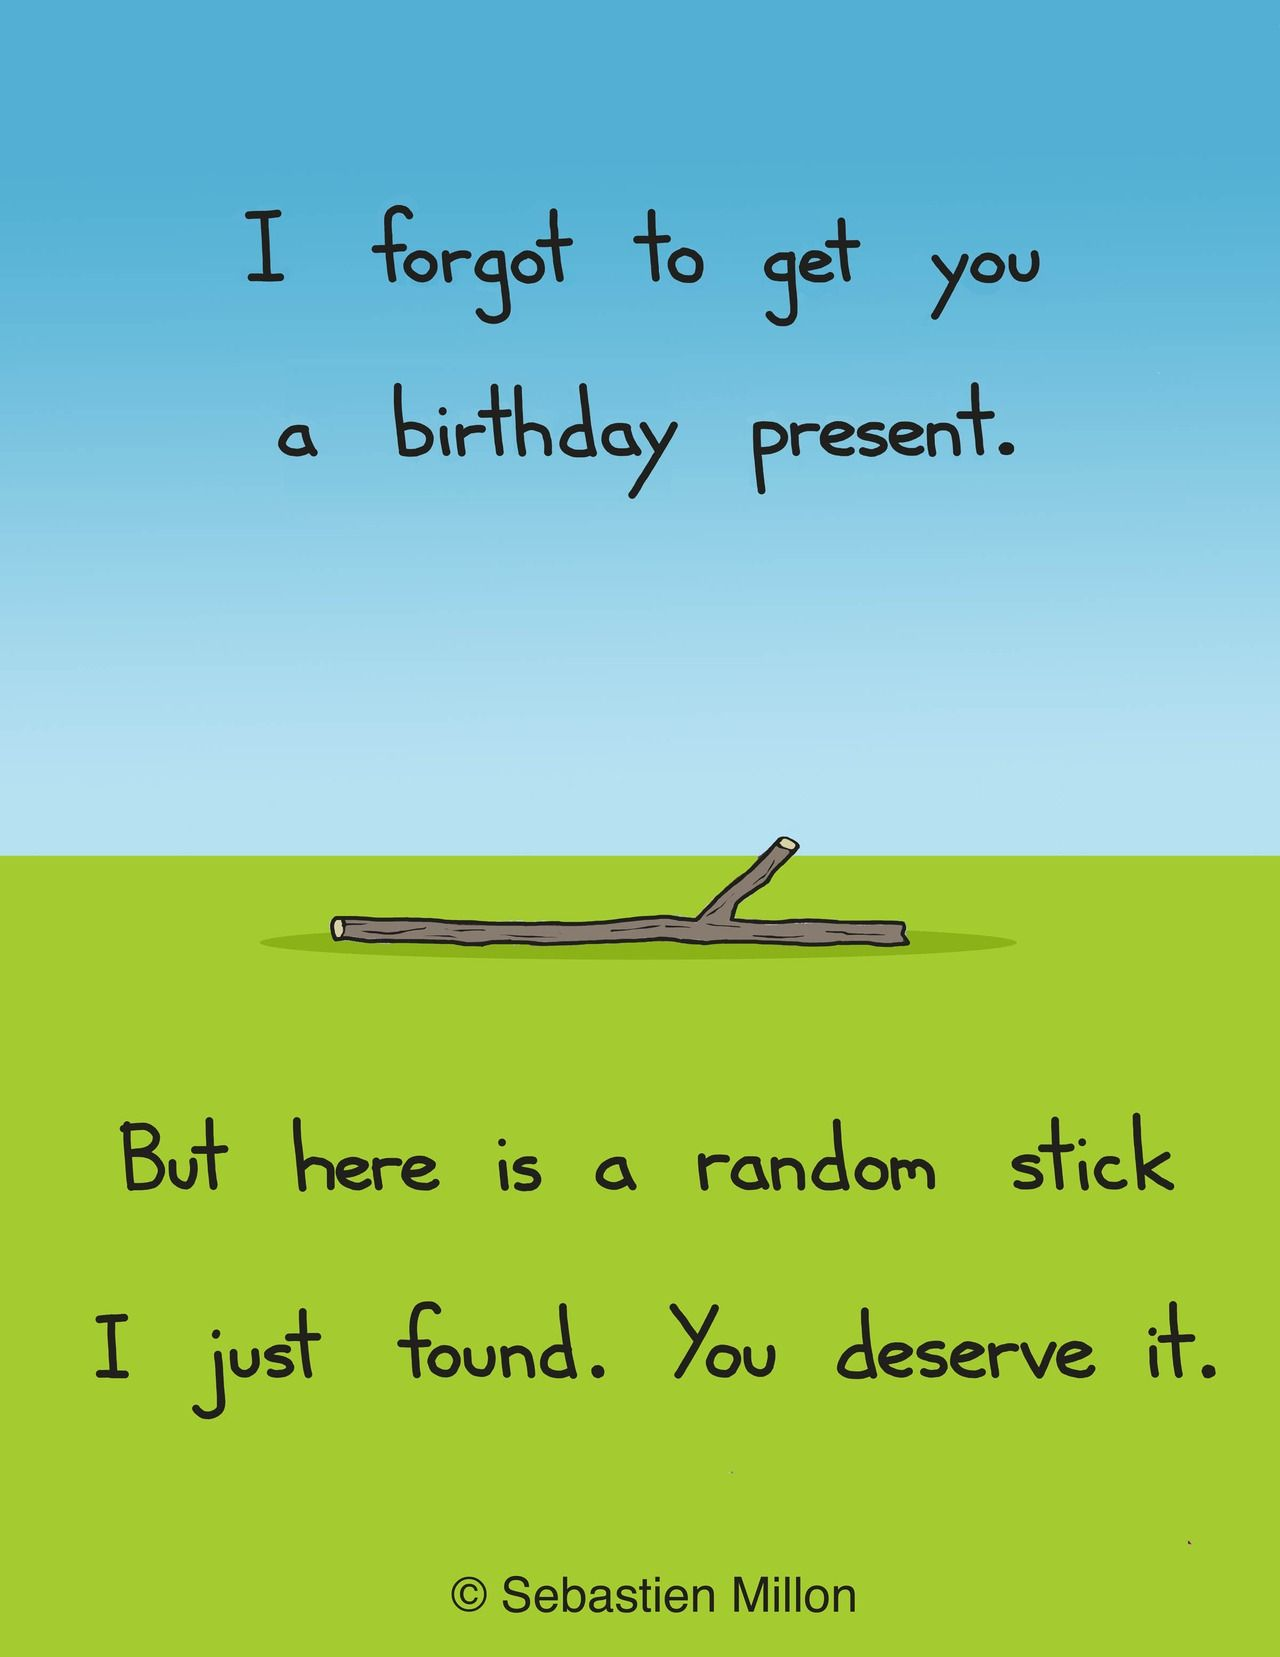 Sebastien Millon S Tumblr Photo Funny Happy Birthday Meme Happy Birthday Quotes Funny Happy Birthday Quotes For Him